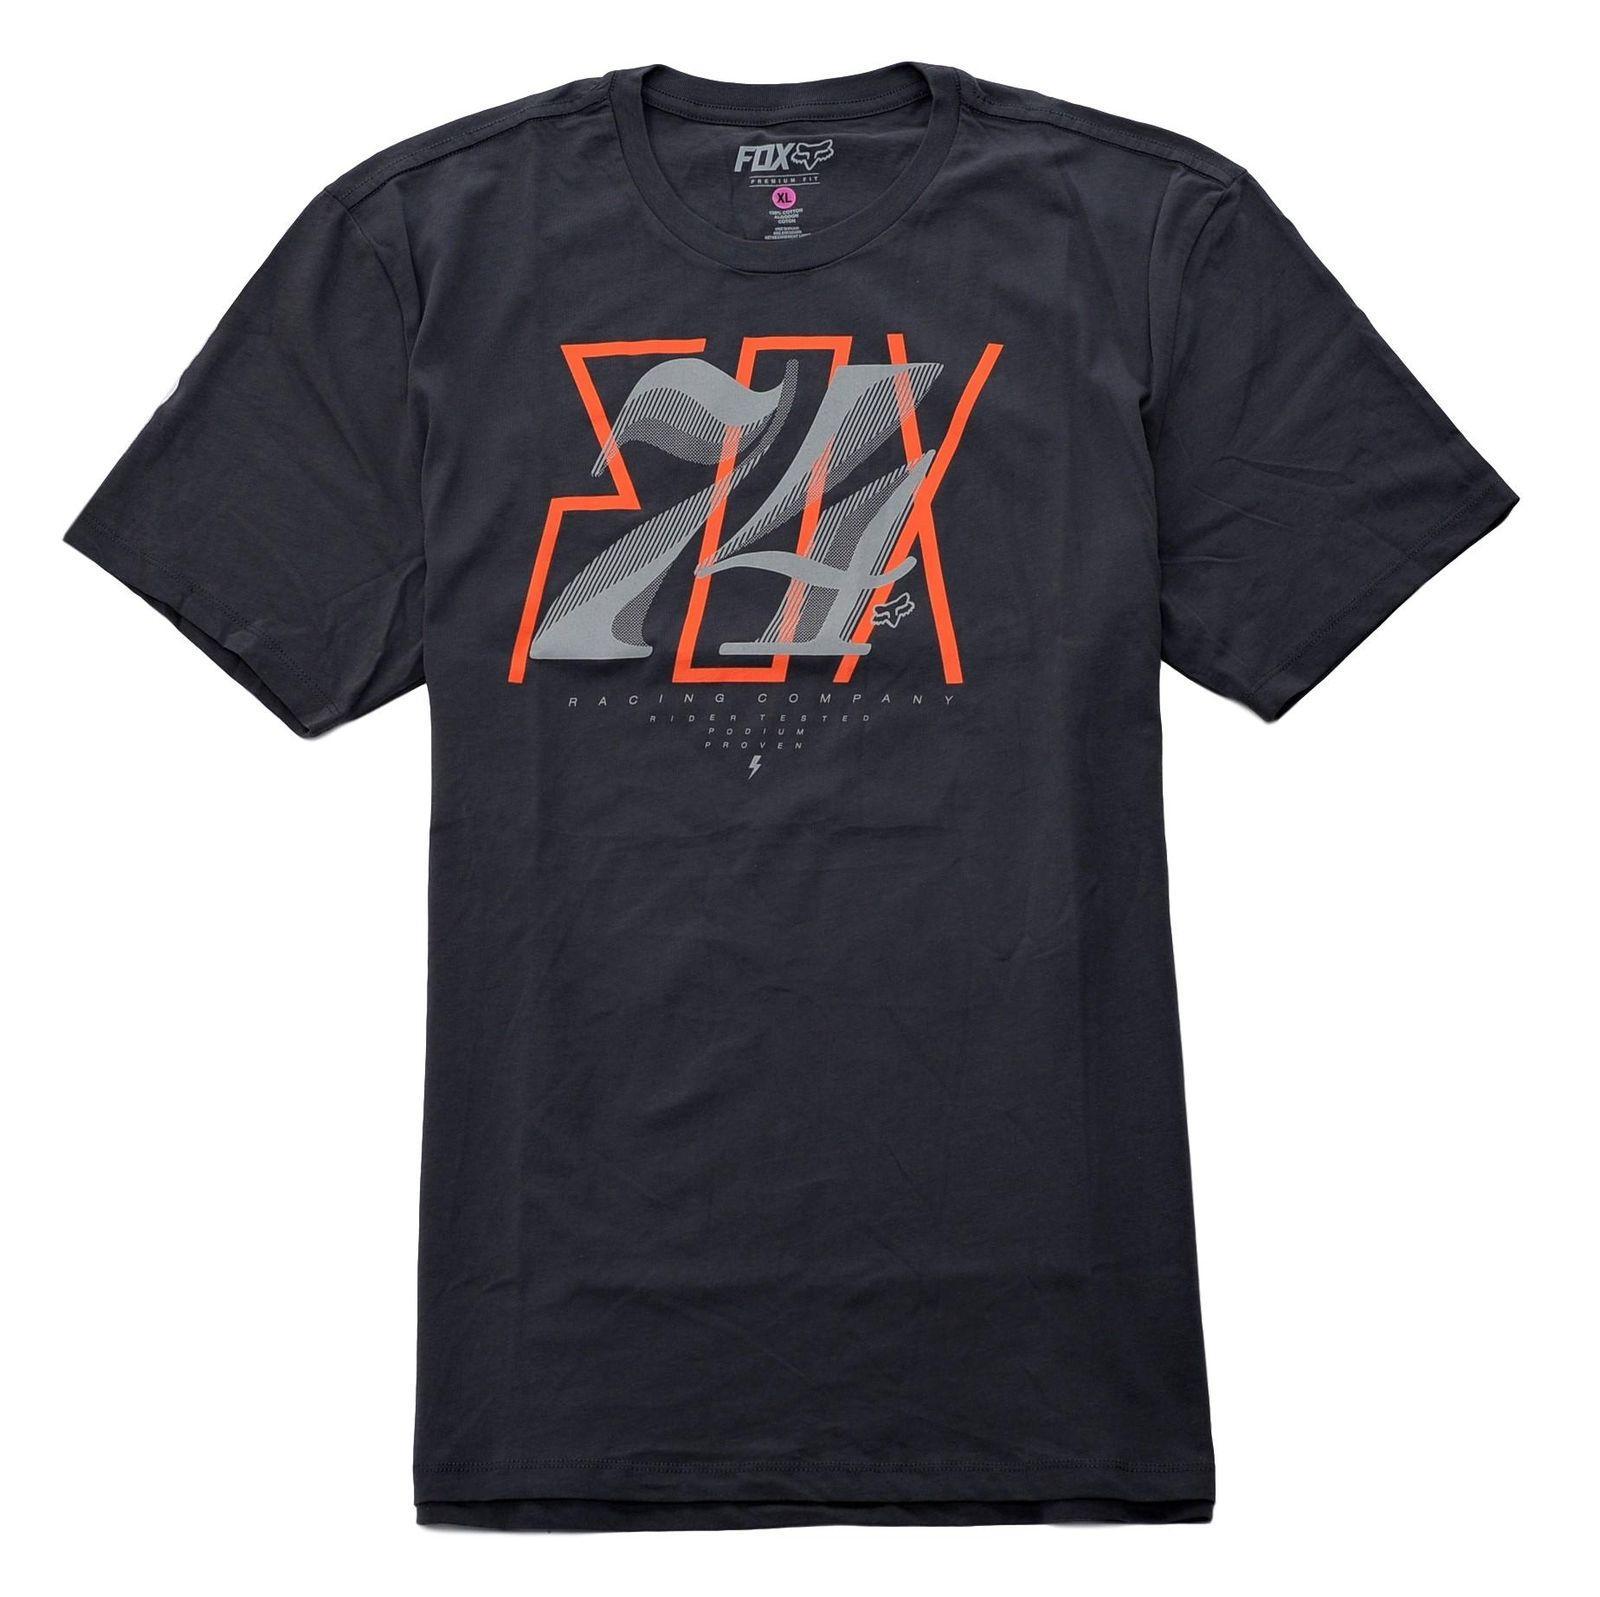 600069a780 Fox Racing Men's Short Sleeve Tee Charcoal X-Large 2017 New Leisure Fashion  t-Shirt men cotton short sleeves